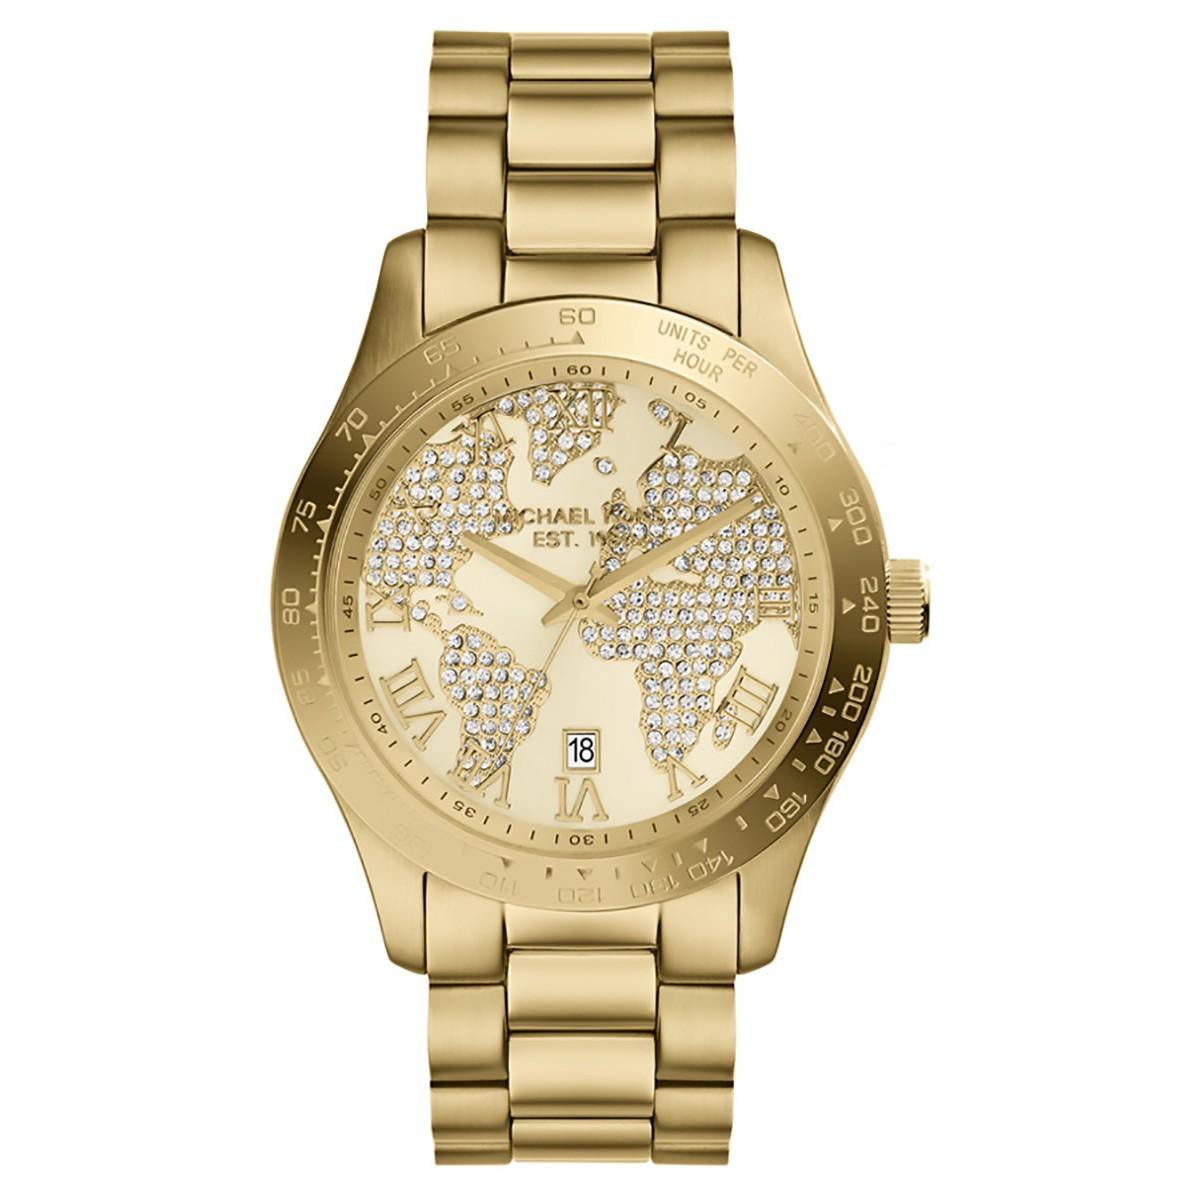 e3edf2173dd18 Compre Relógio Michael Kors Layton em 10X   Tri-Jóia Shop